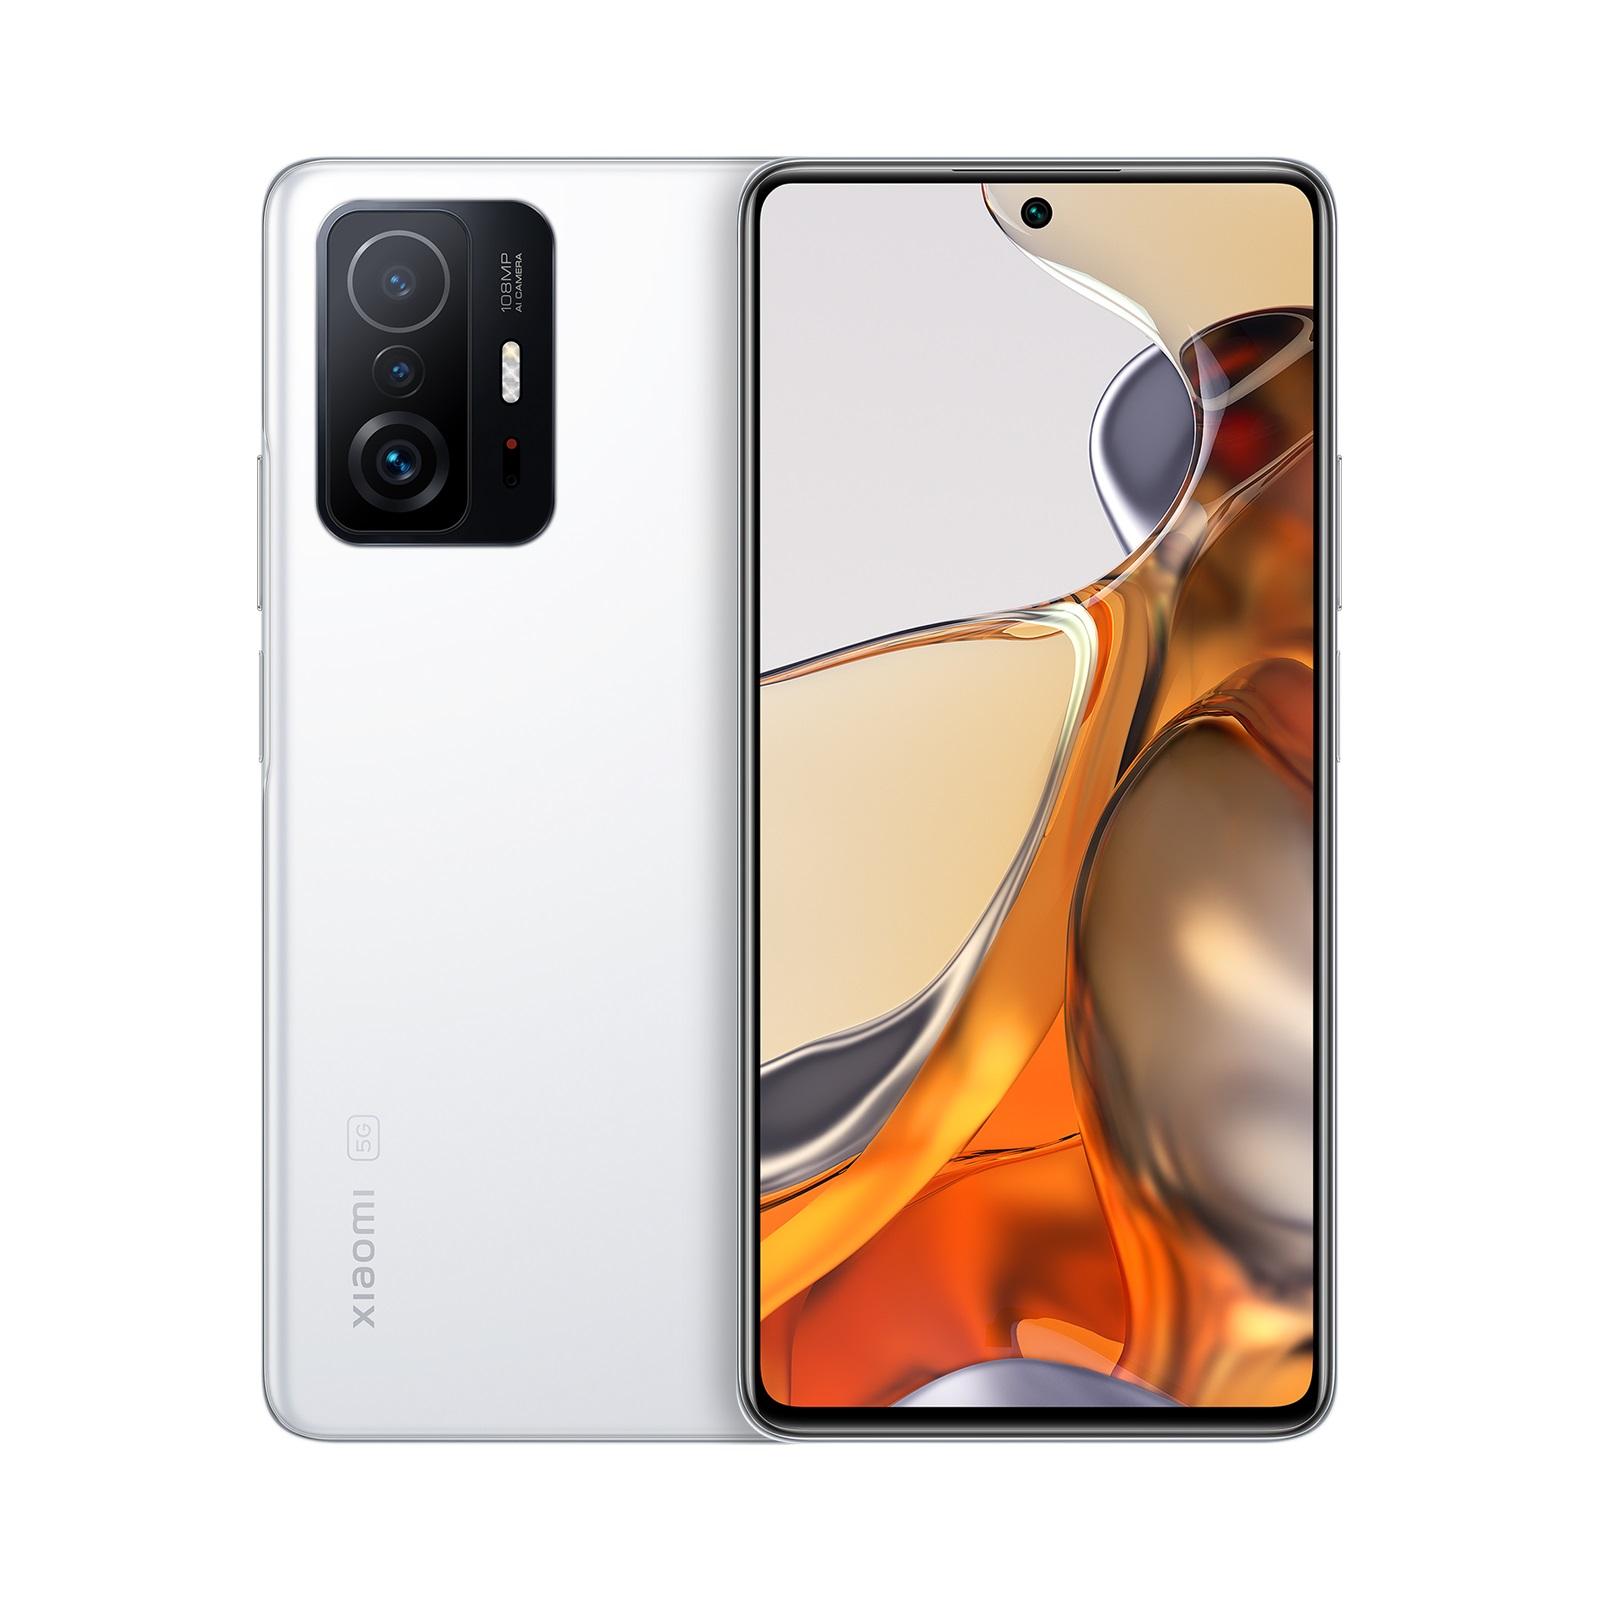 smartfon Xiaomi 11T Pro smartphone